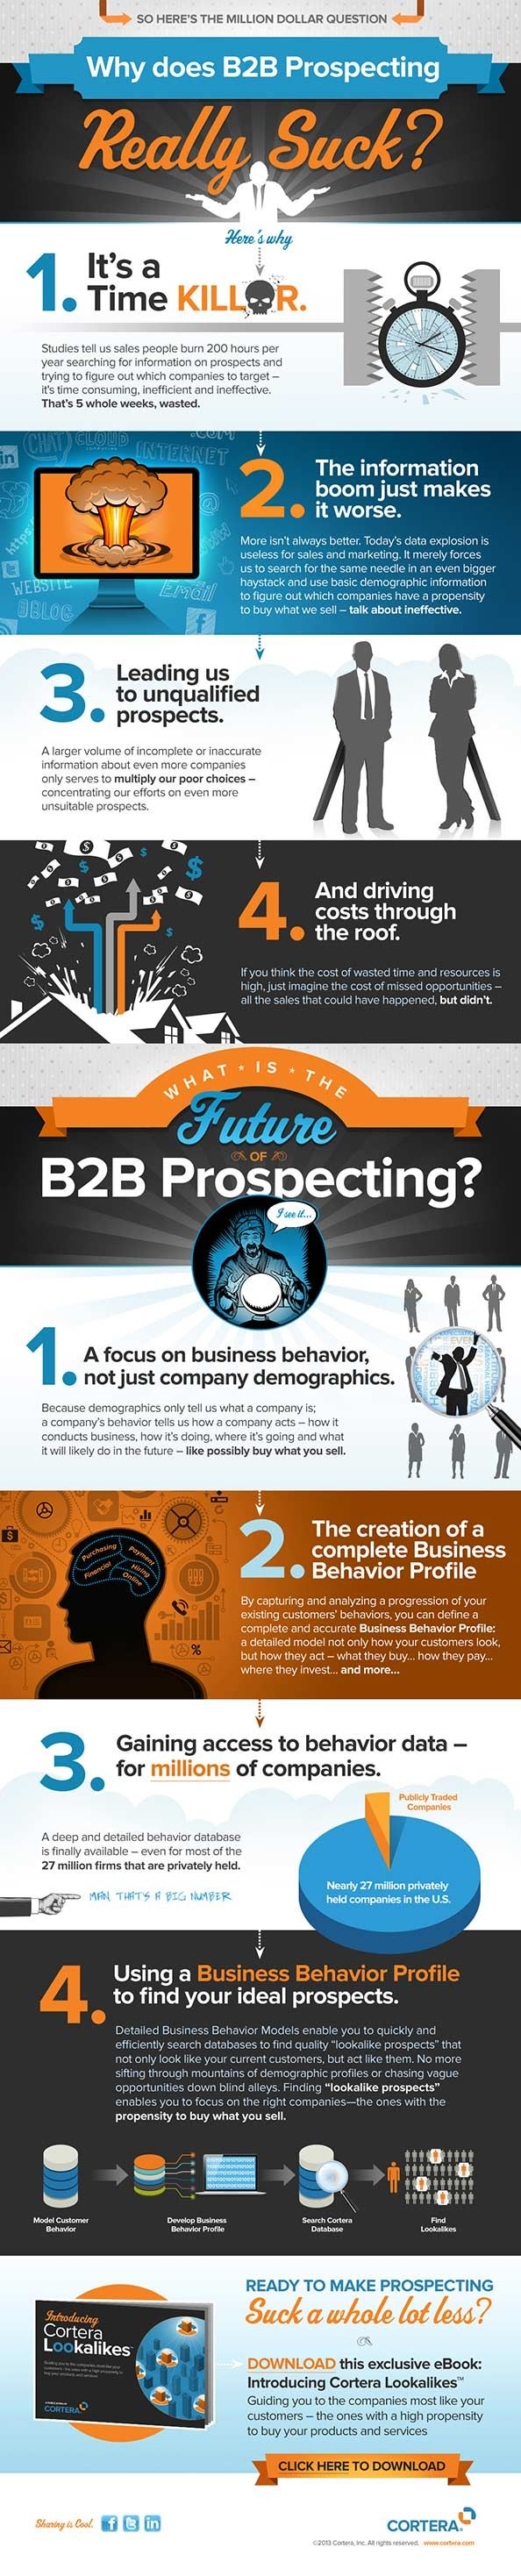 B2B Prospecting